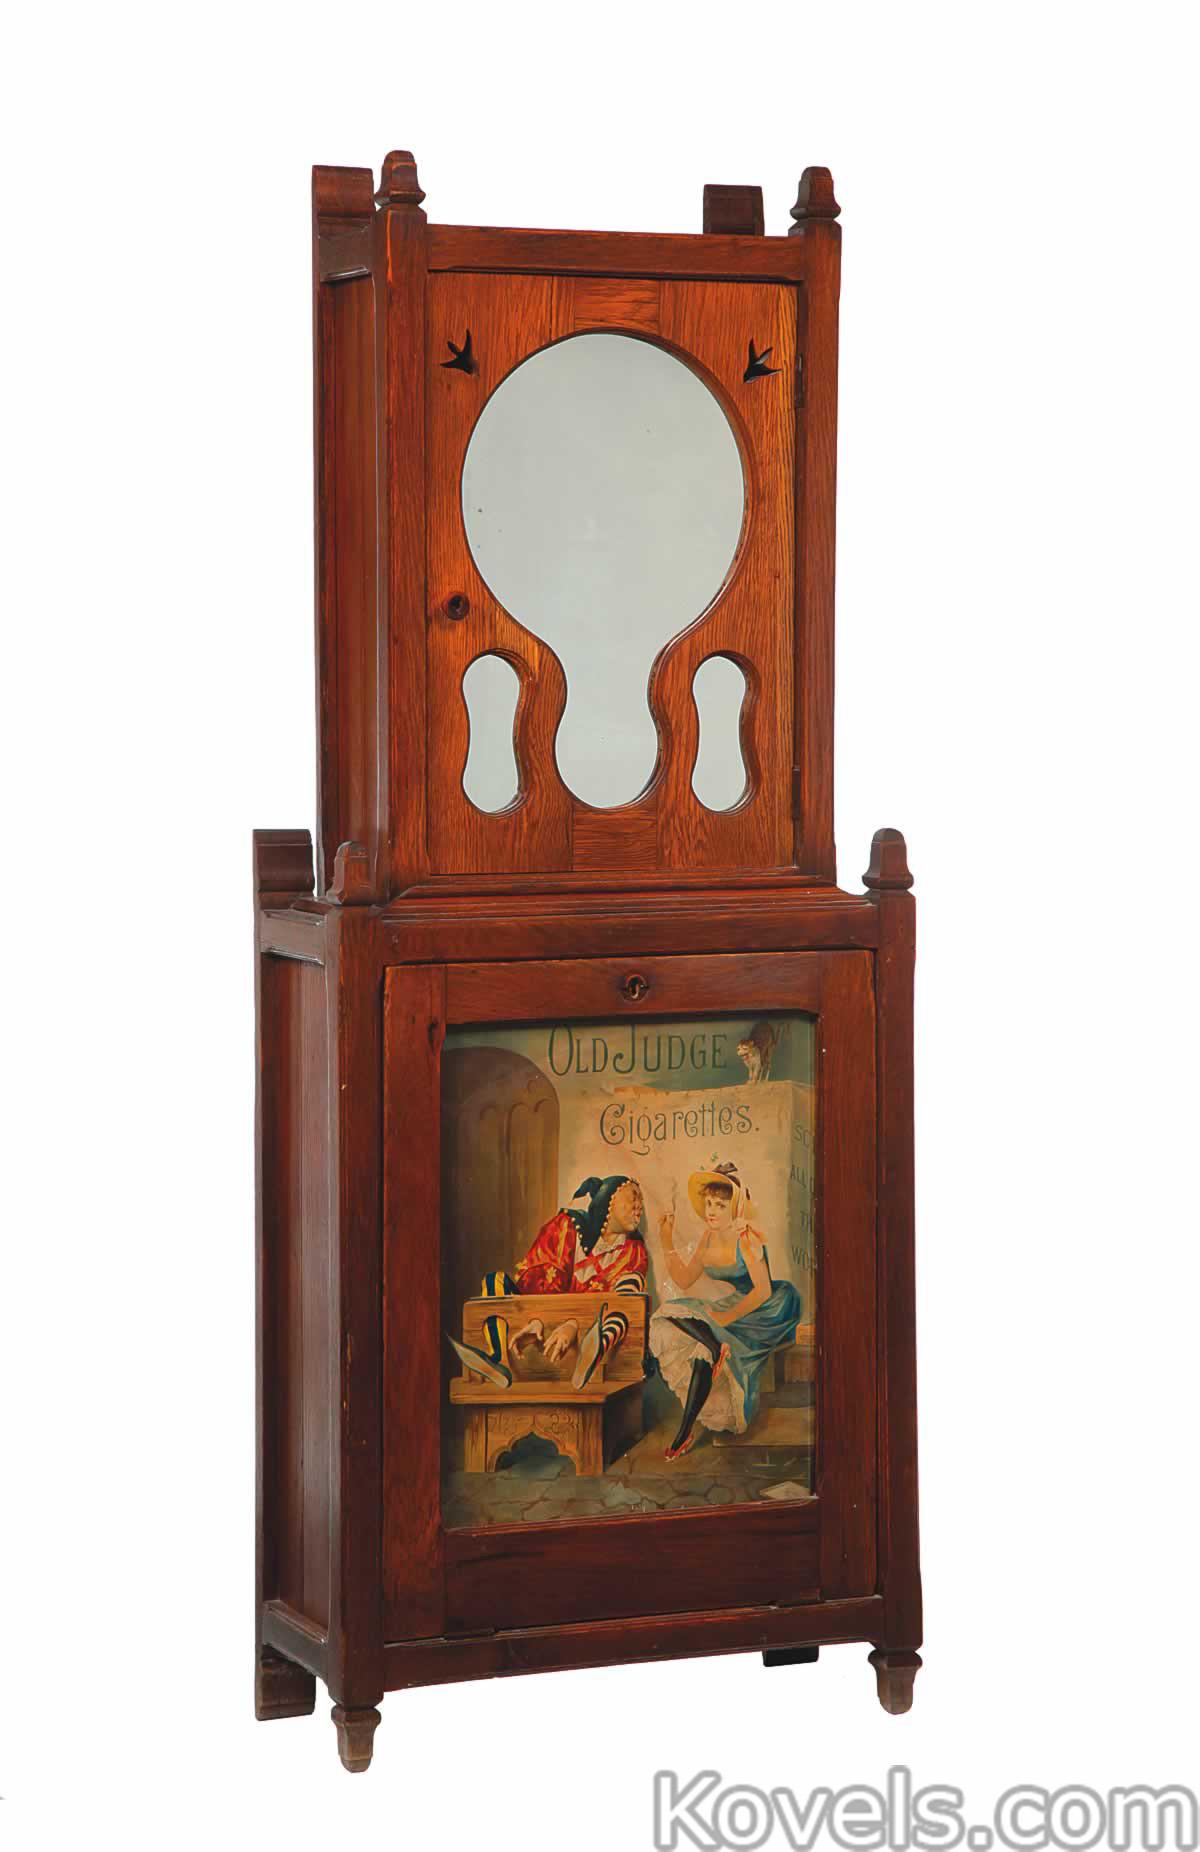 Antique furniture furniture clocks lighting price for Furniture valuation guides